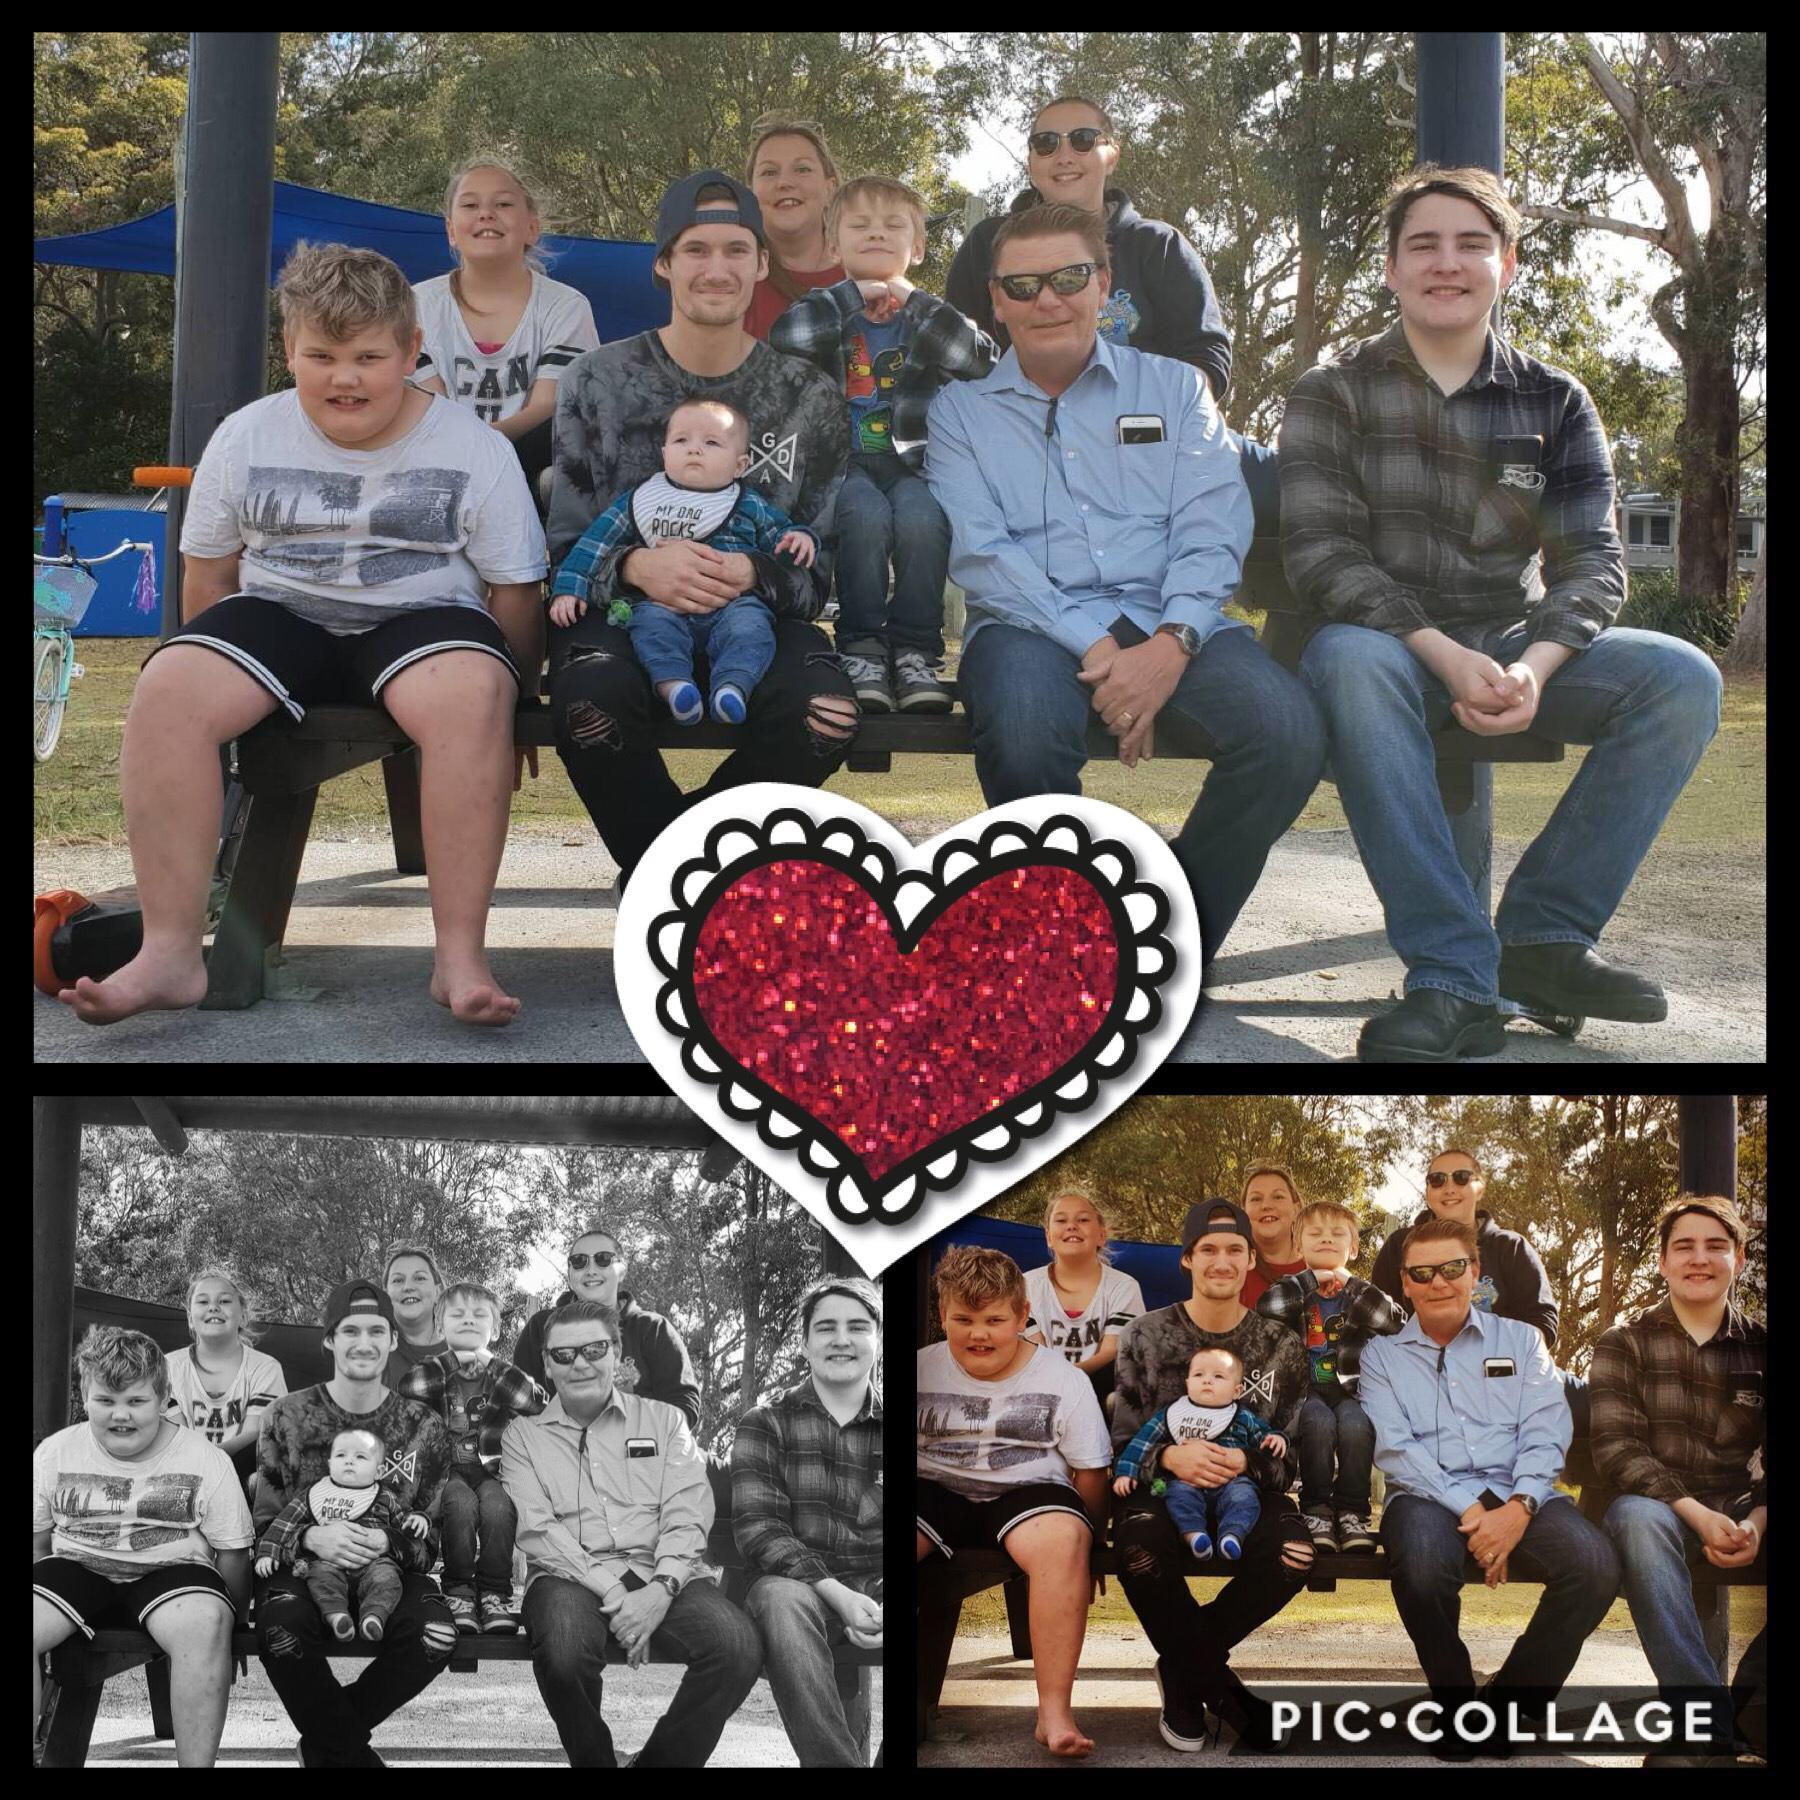 My family love u all 💘